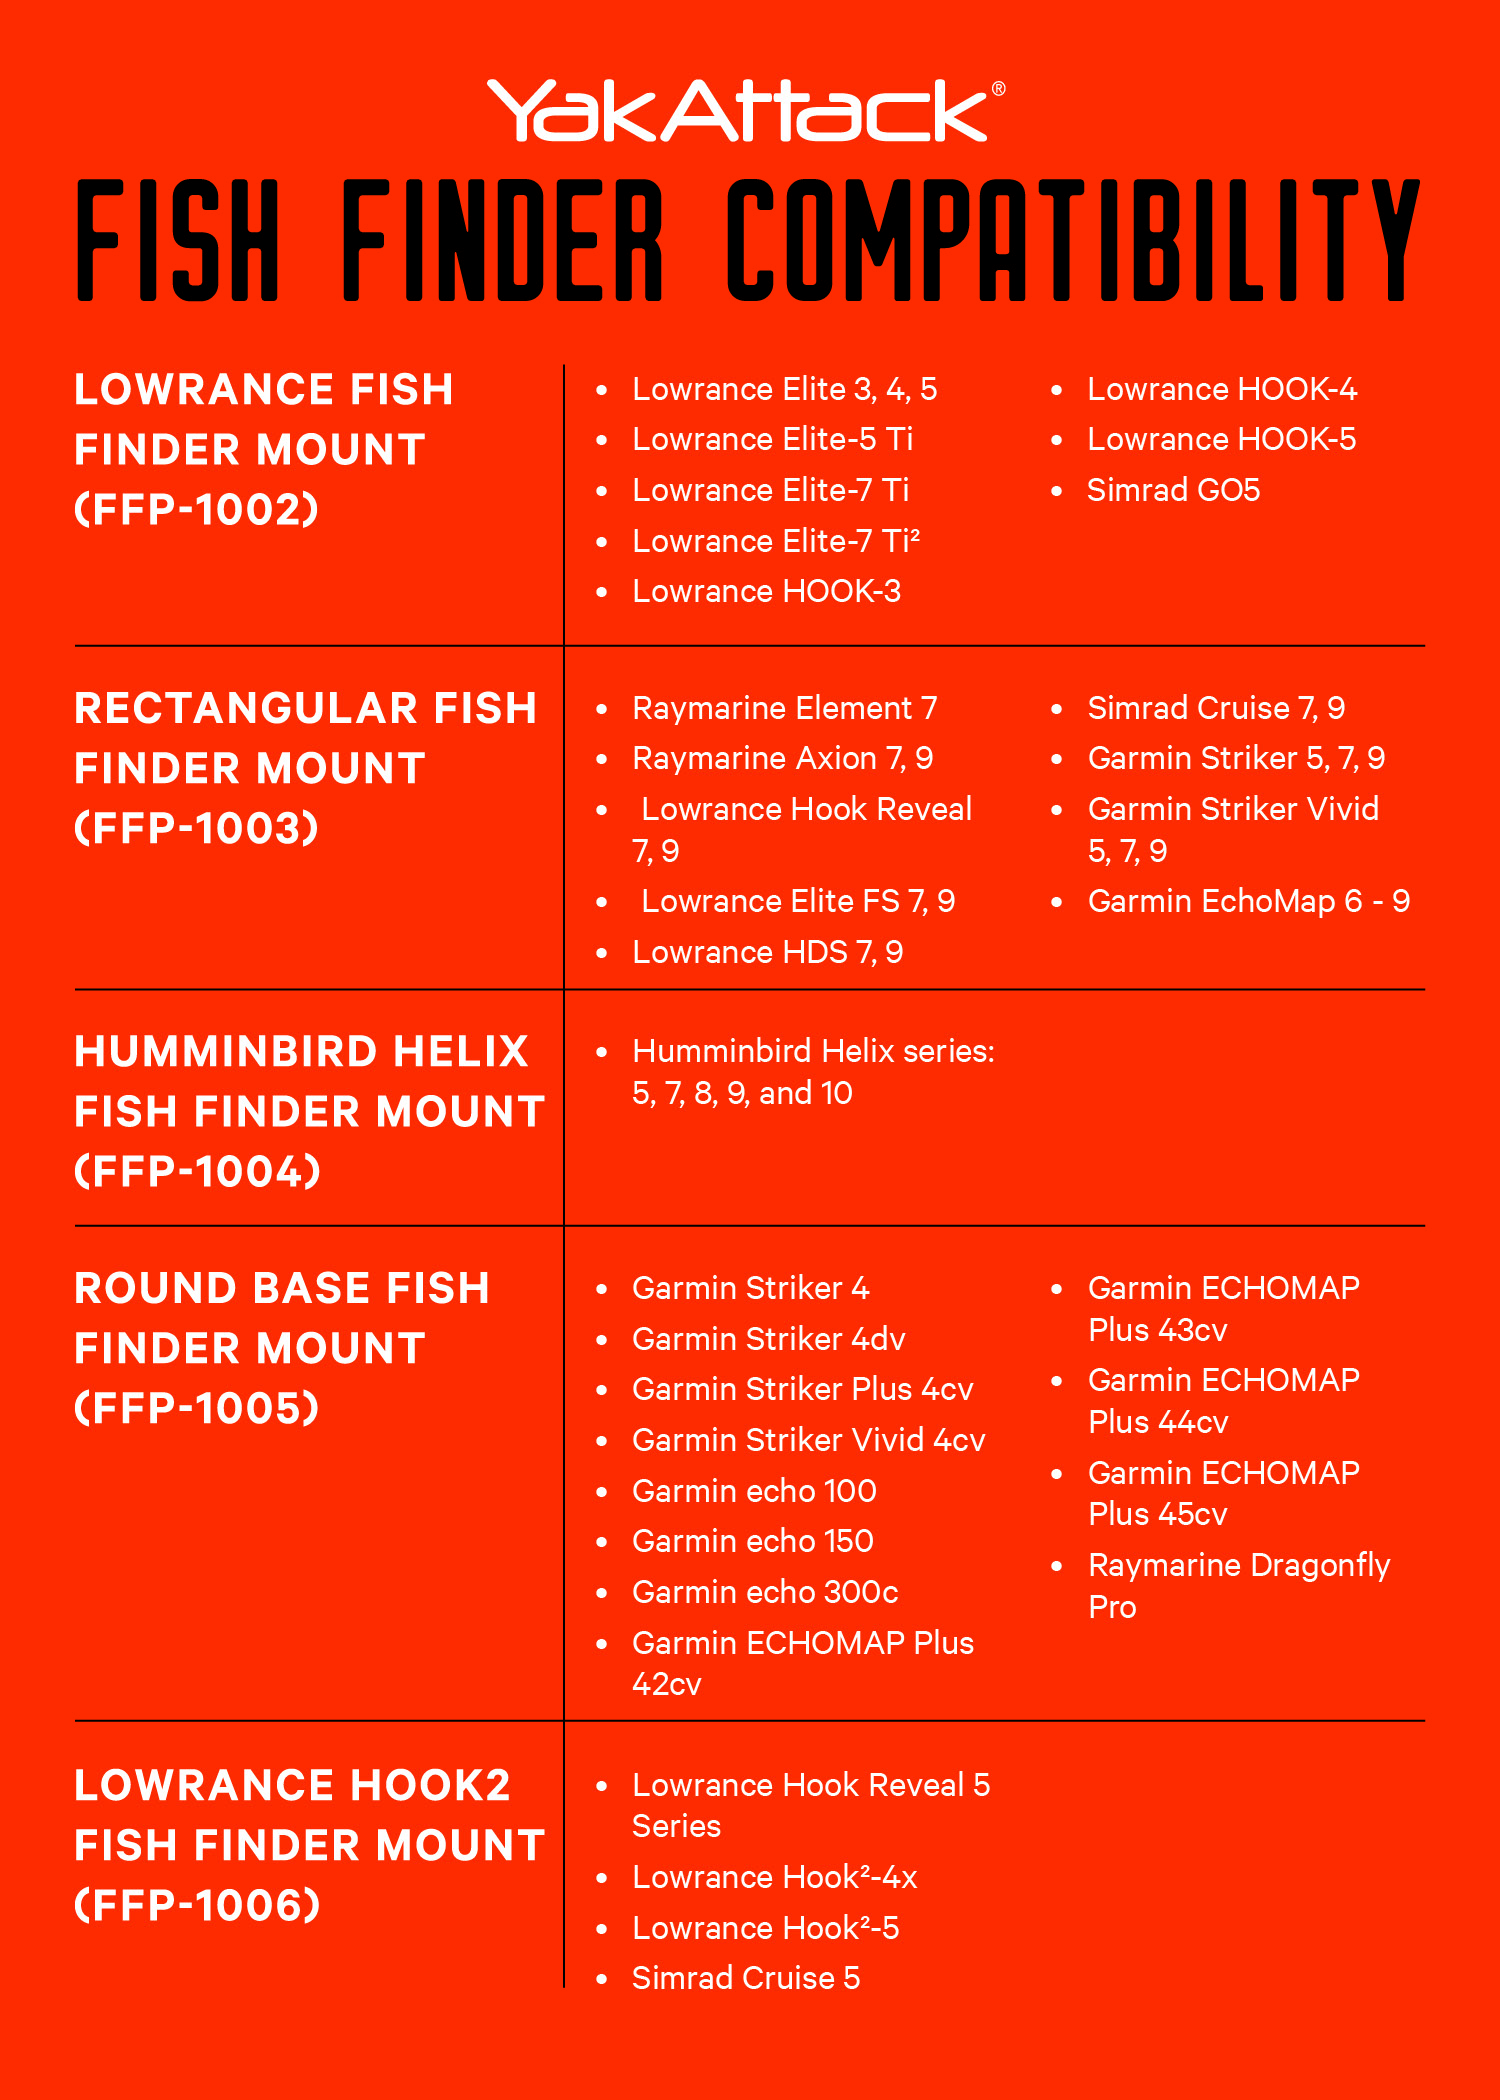 fishfindermountcompatibility.jpg